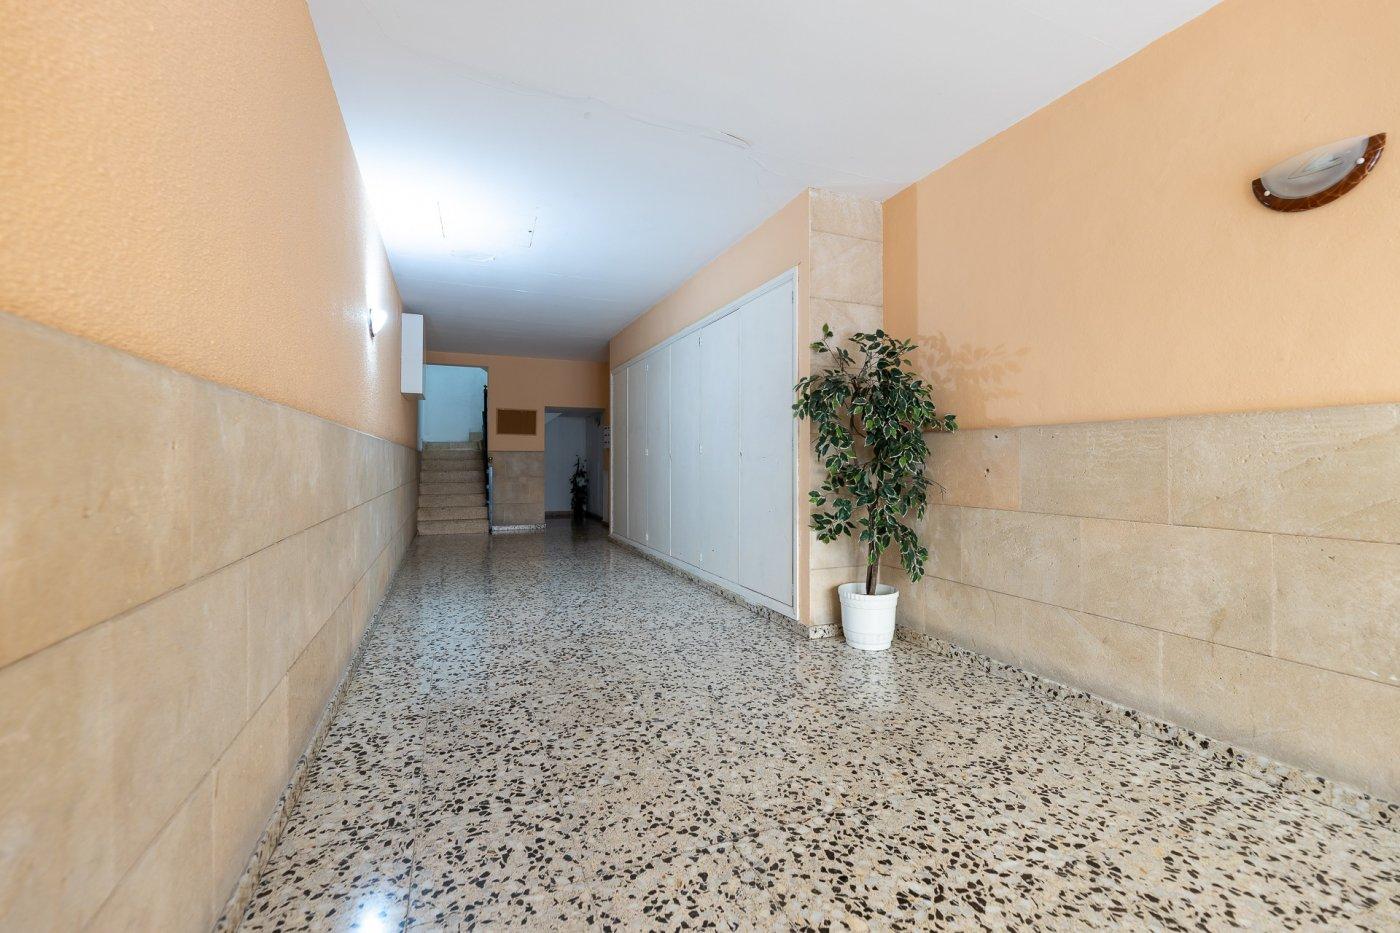 Interesante piso en arenal-llucmajor - imagenInmueble20